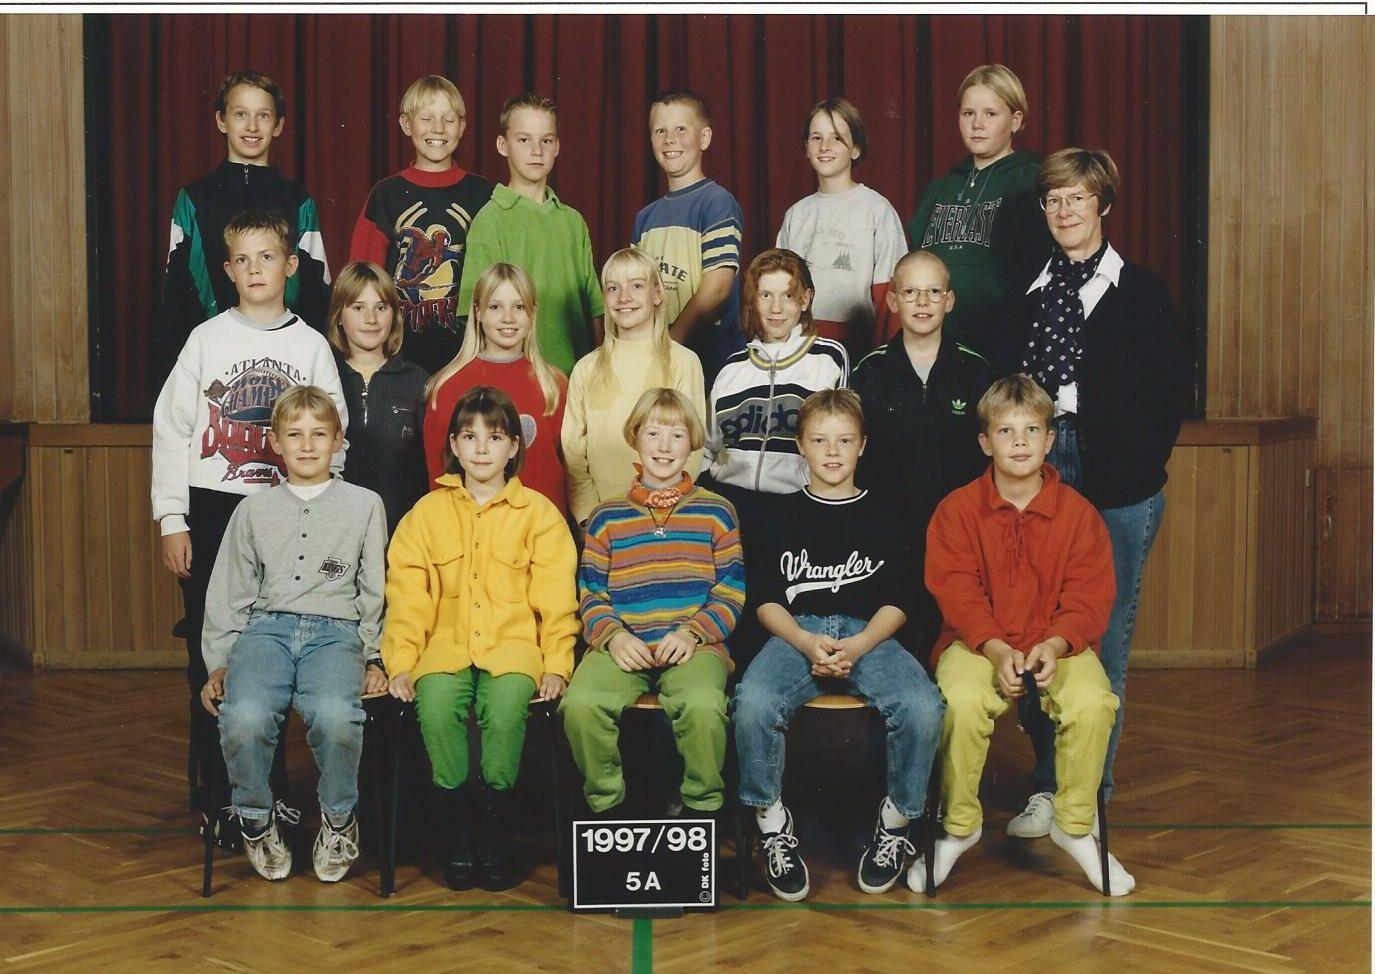 1997-5a